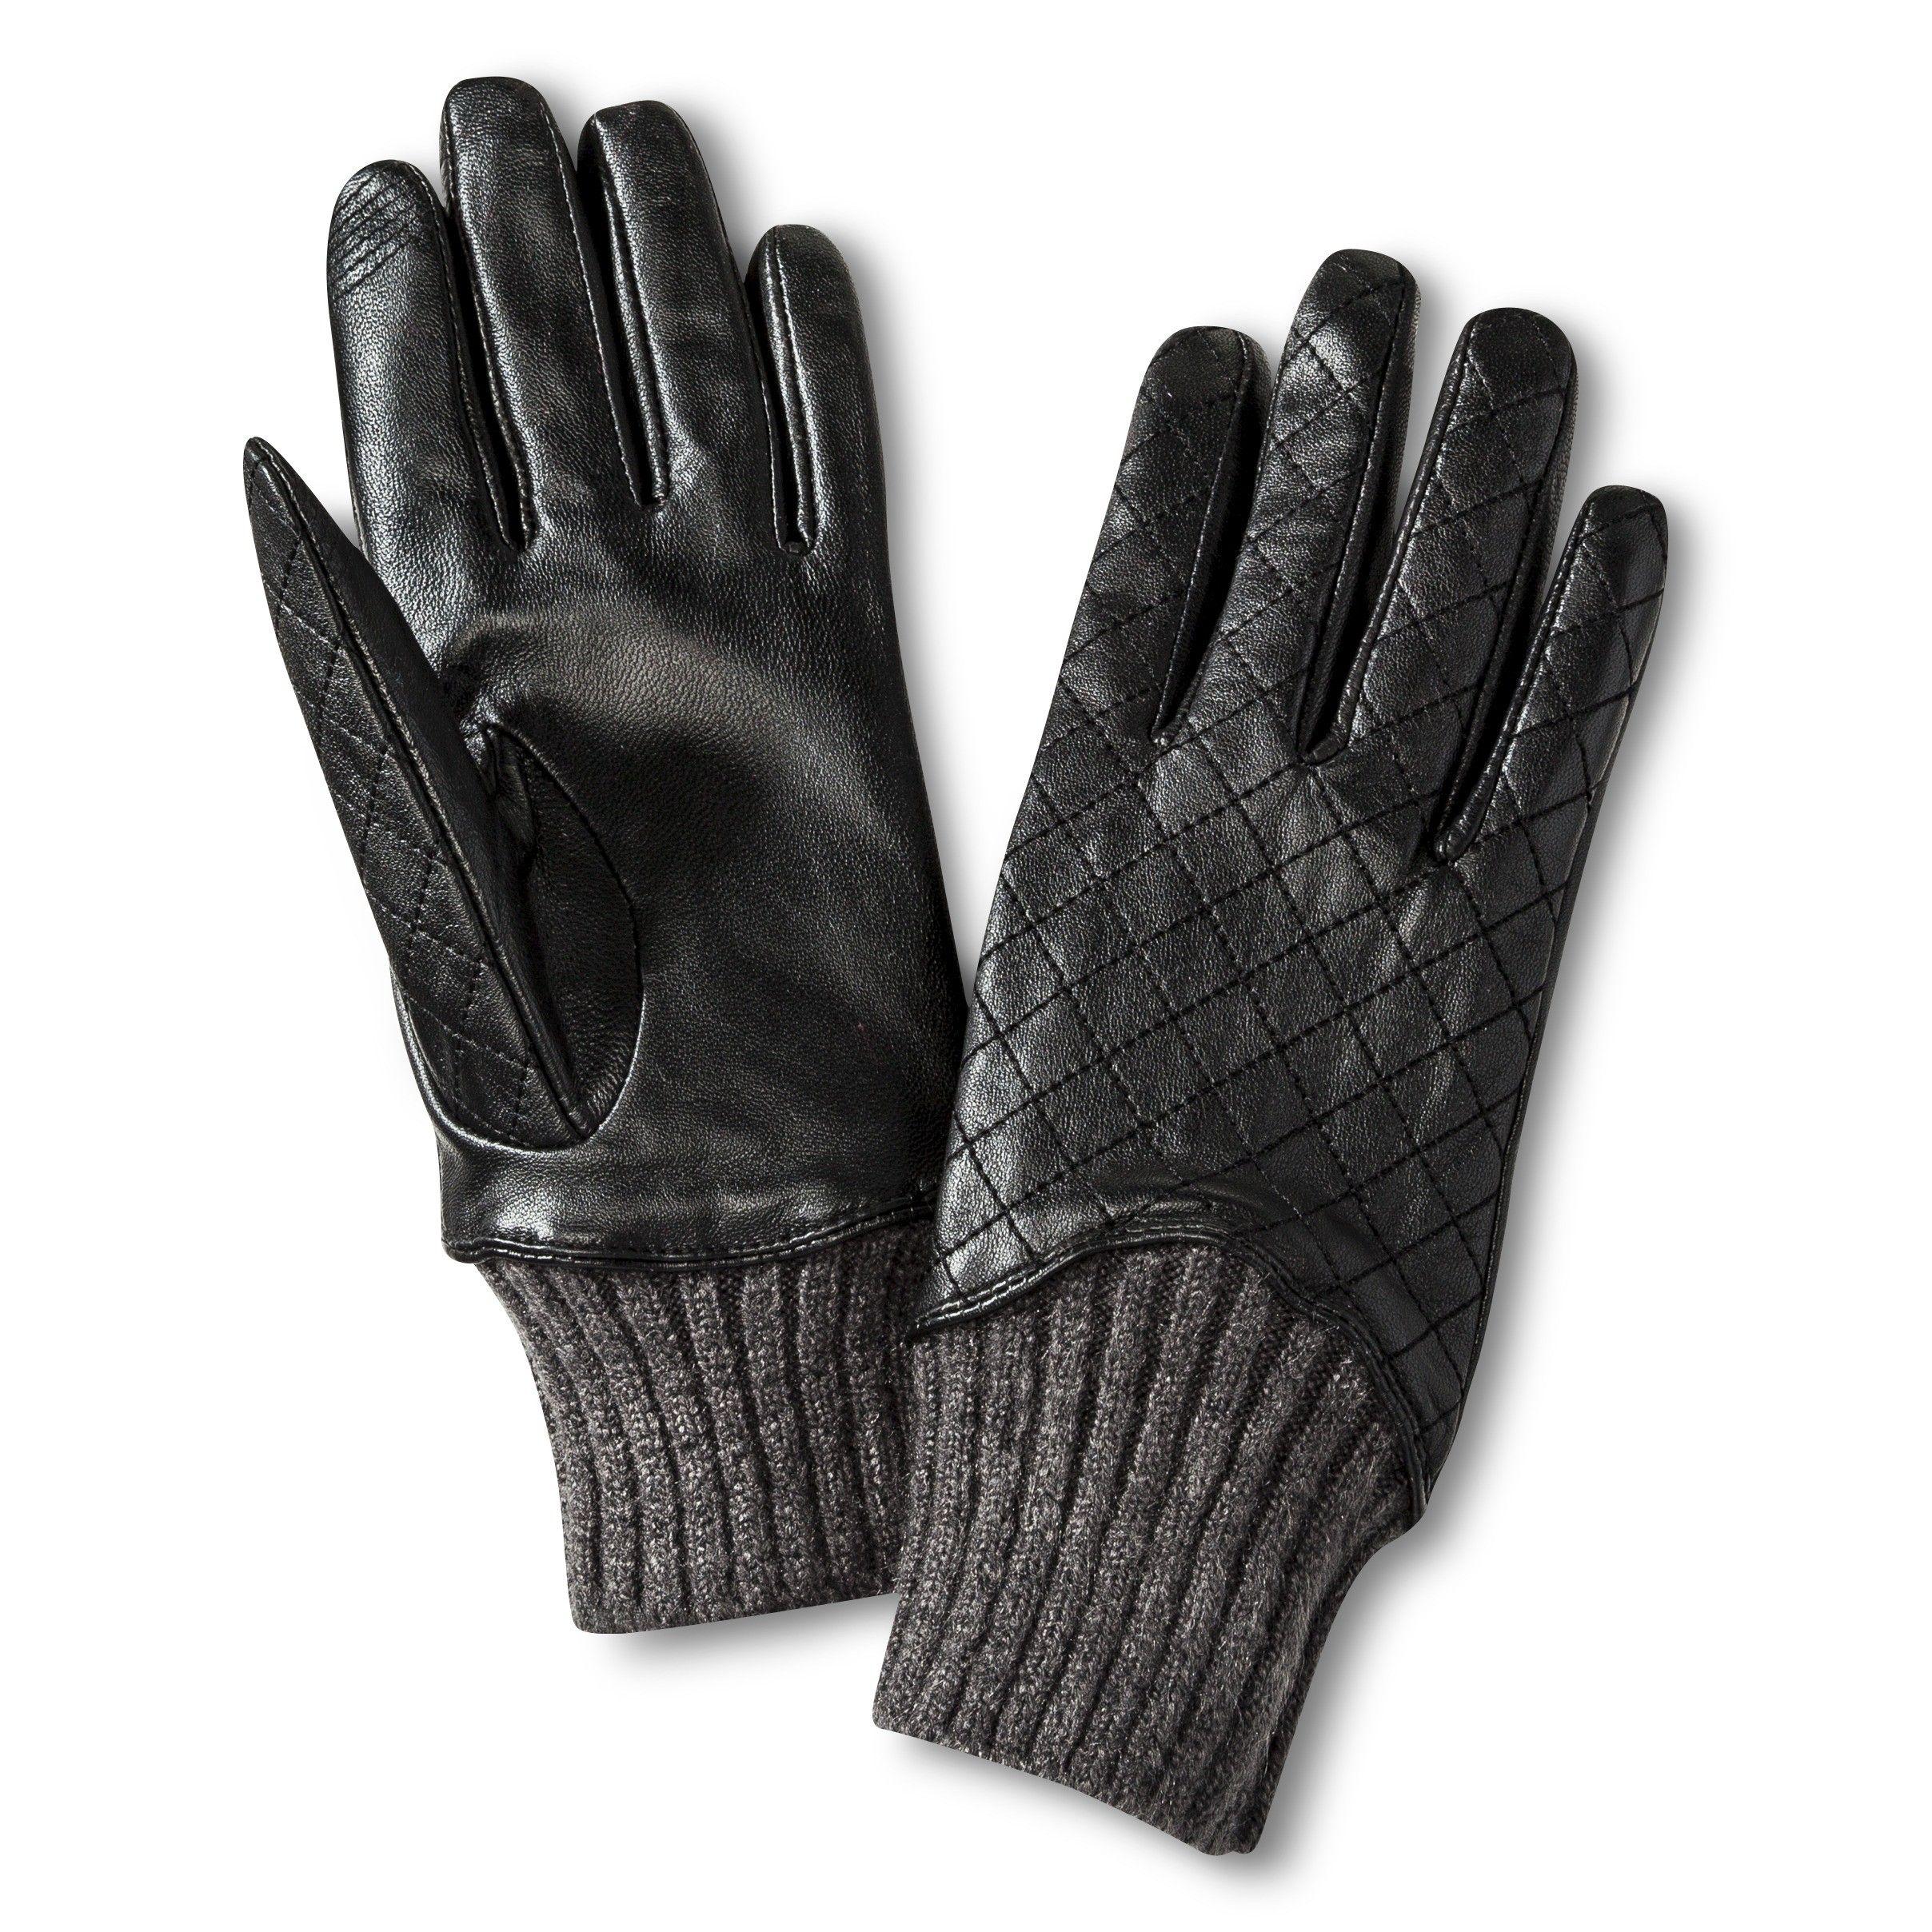 Black gloves at target - Women S Leather Gloves With Knit Detail Black Target